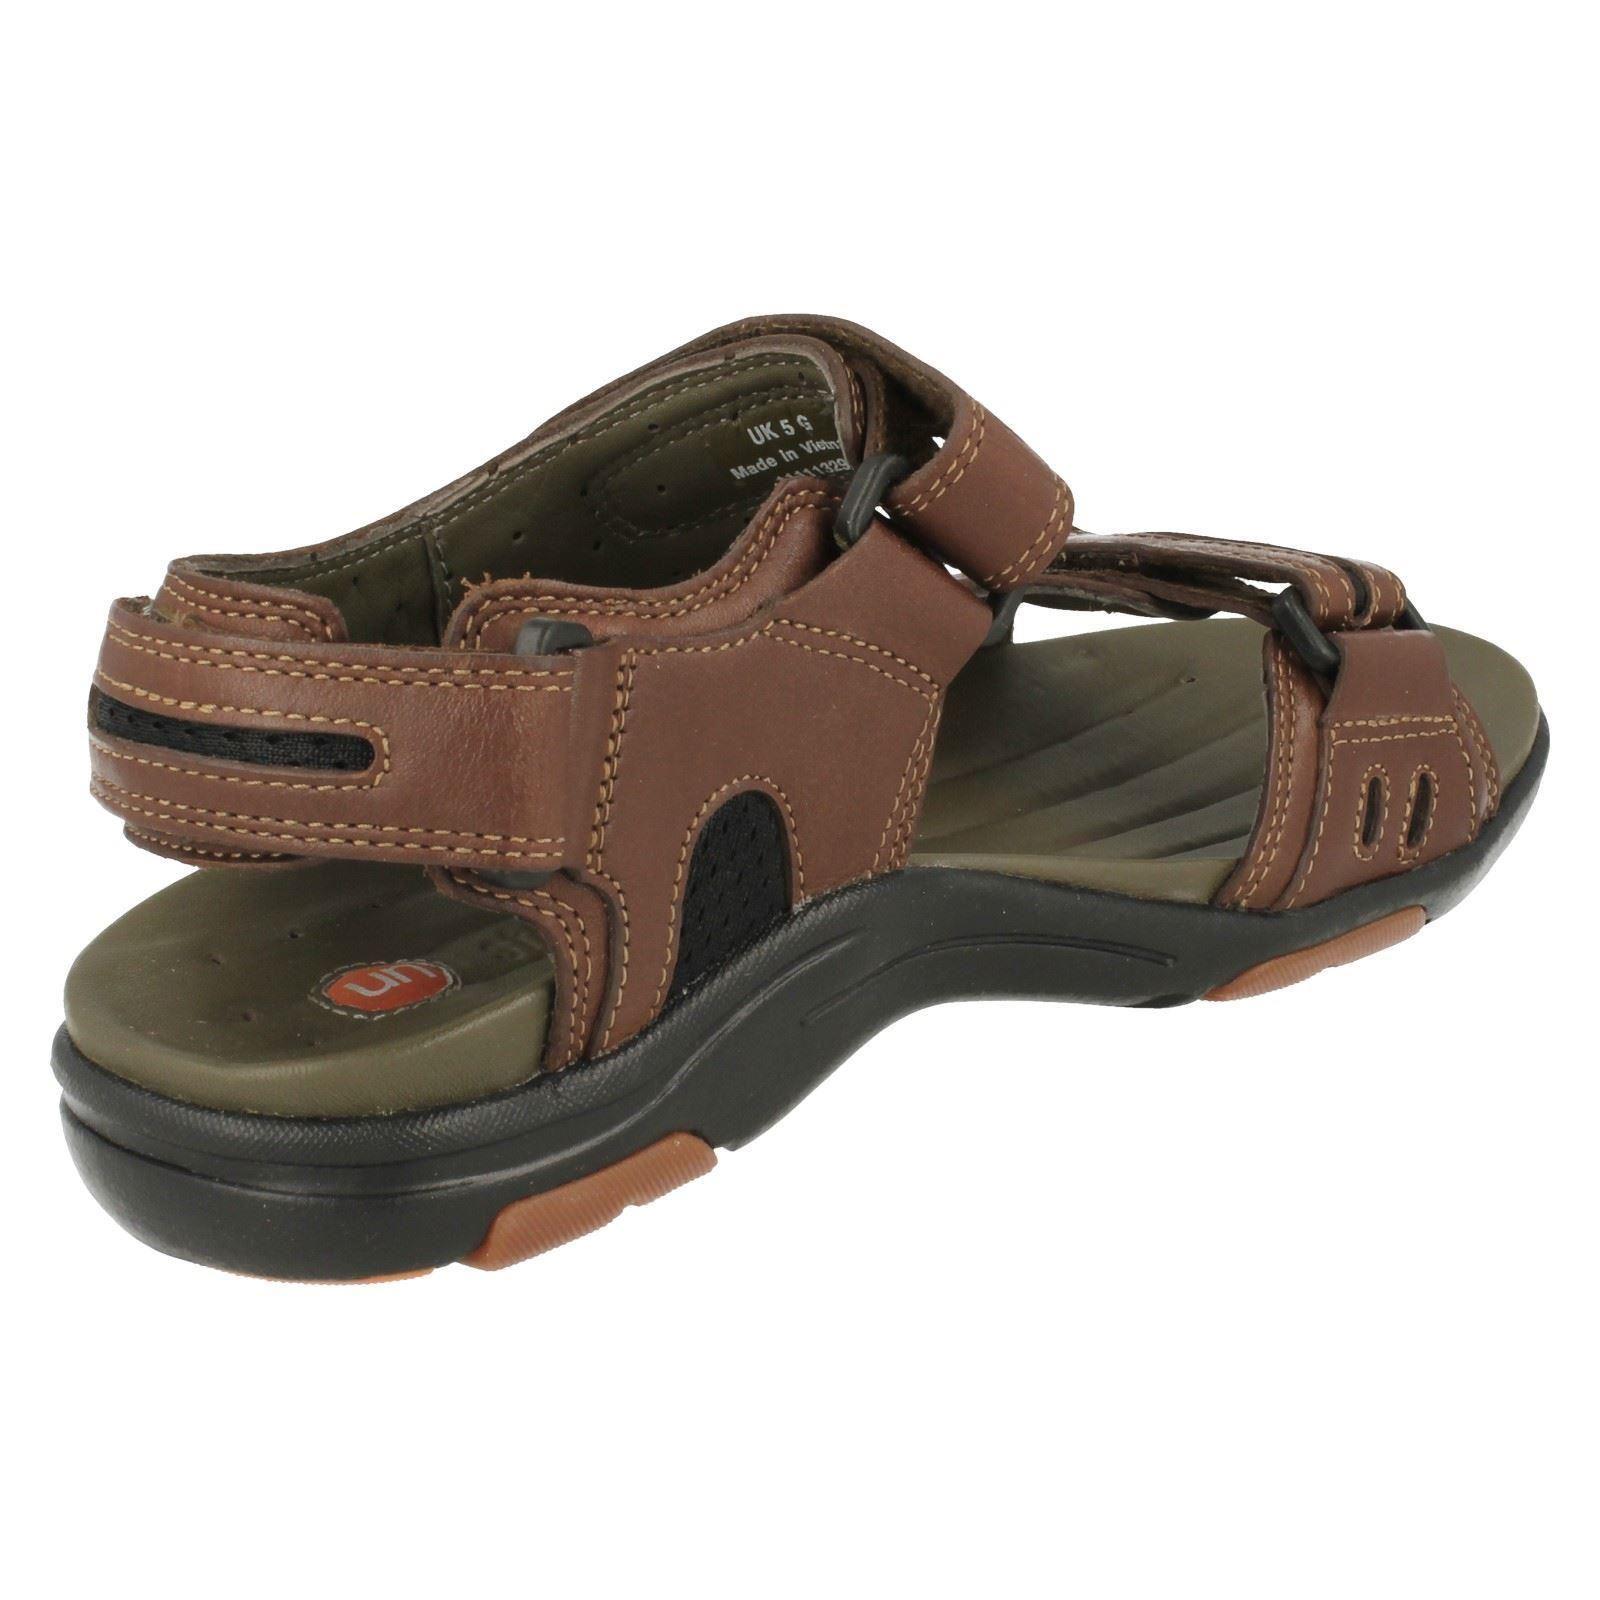 mens clarks leather velcro unstructured sandals un charter